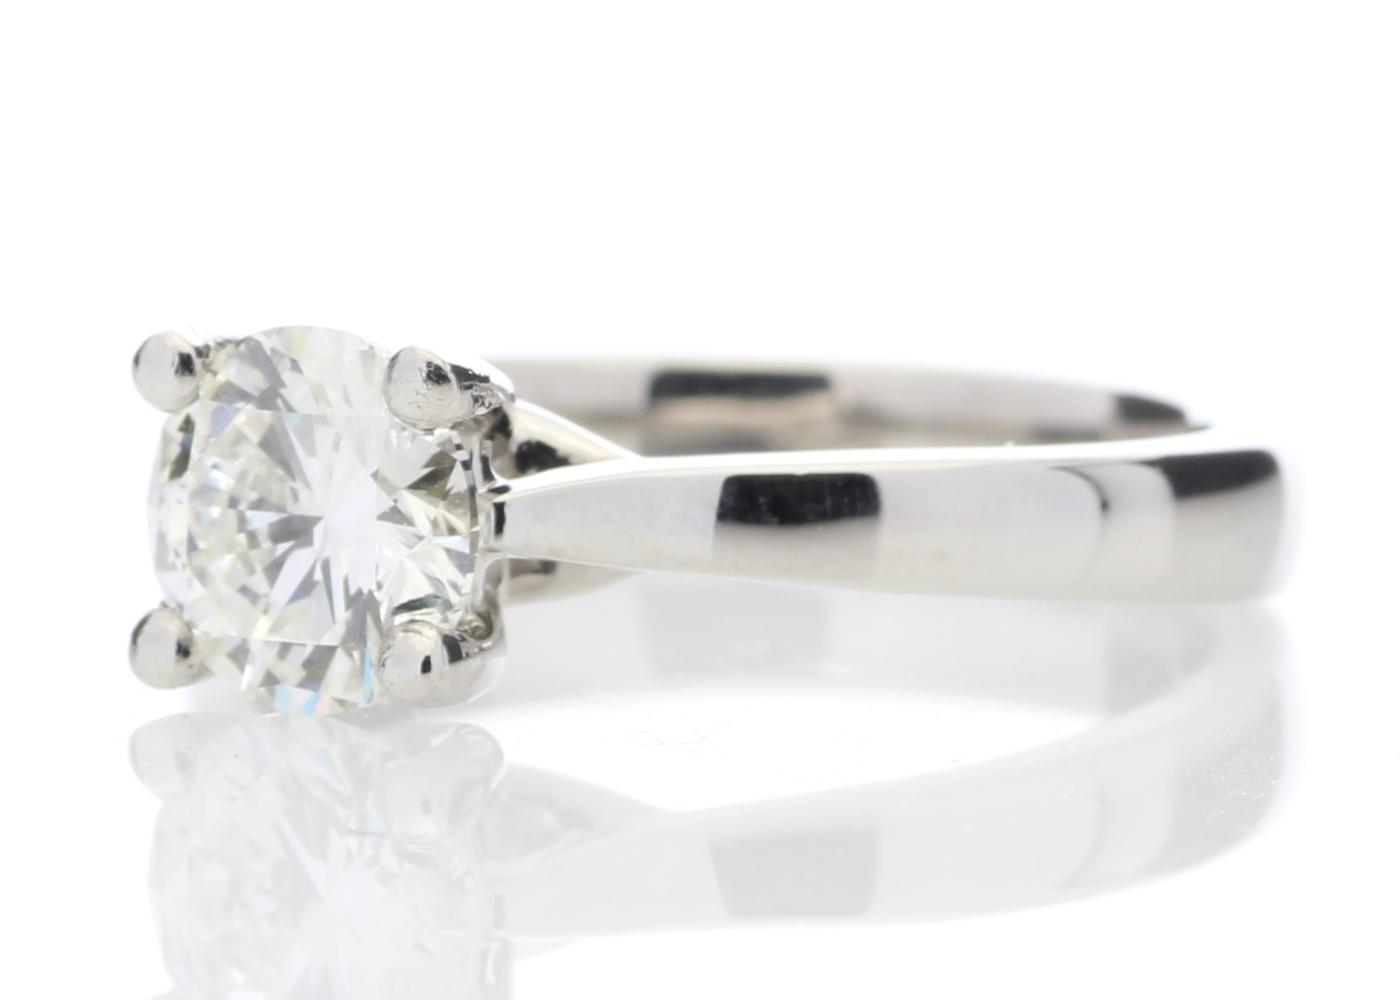 Platinum Single Stone Wire Set Diamond Ring 1.01 Carats - Image 2 of 5